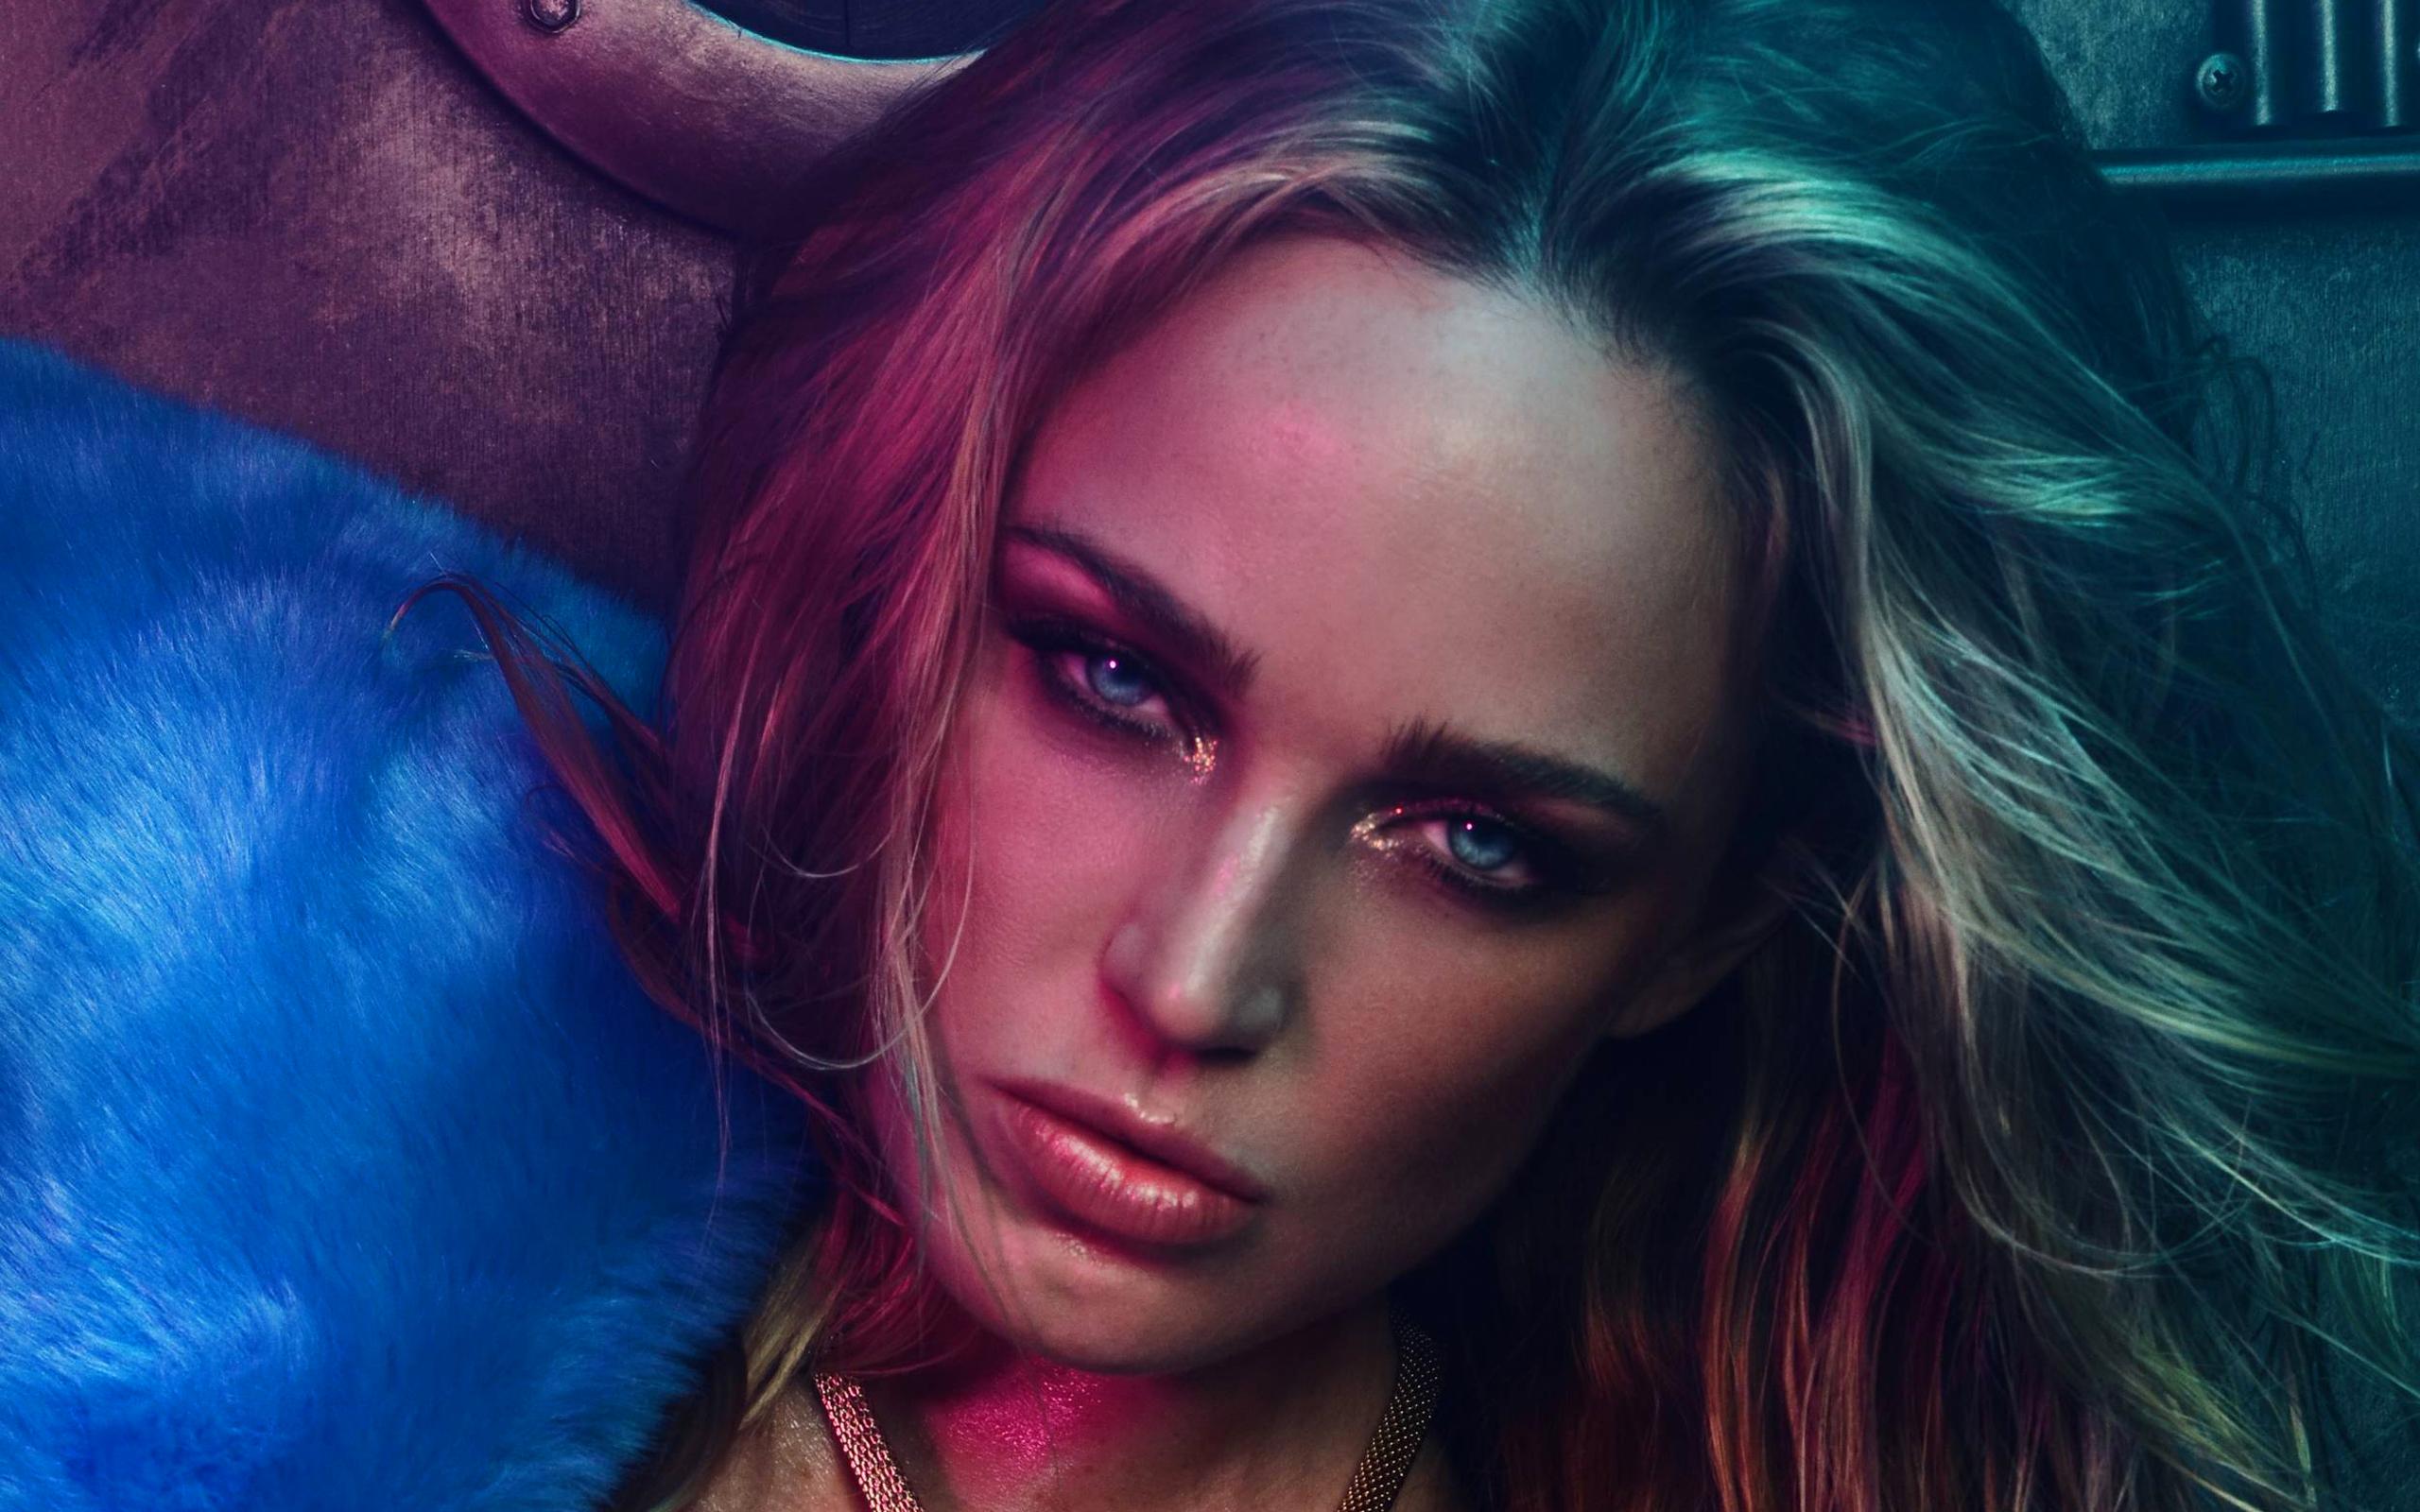 Caity Lotz, Portrait, American Actress, Beautiful Woman, - Girl , HD Wallpaper & Backgrounds